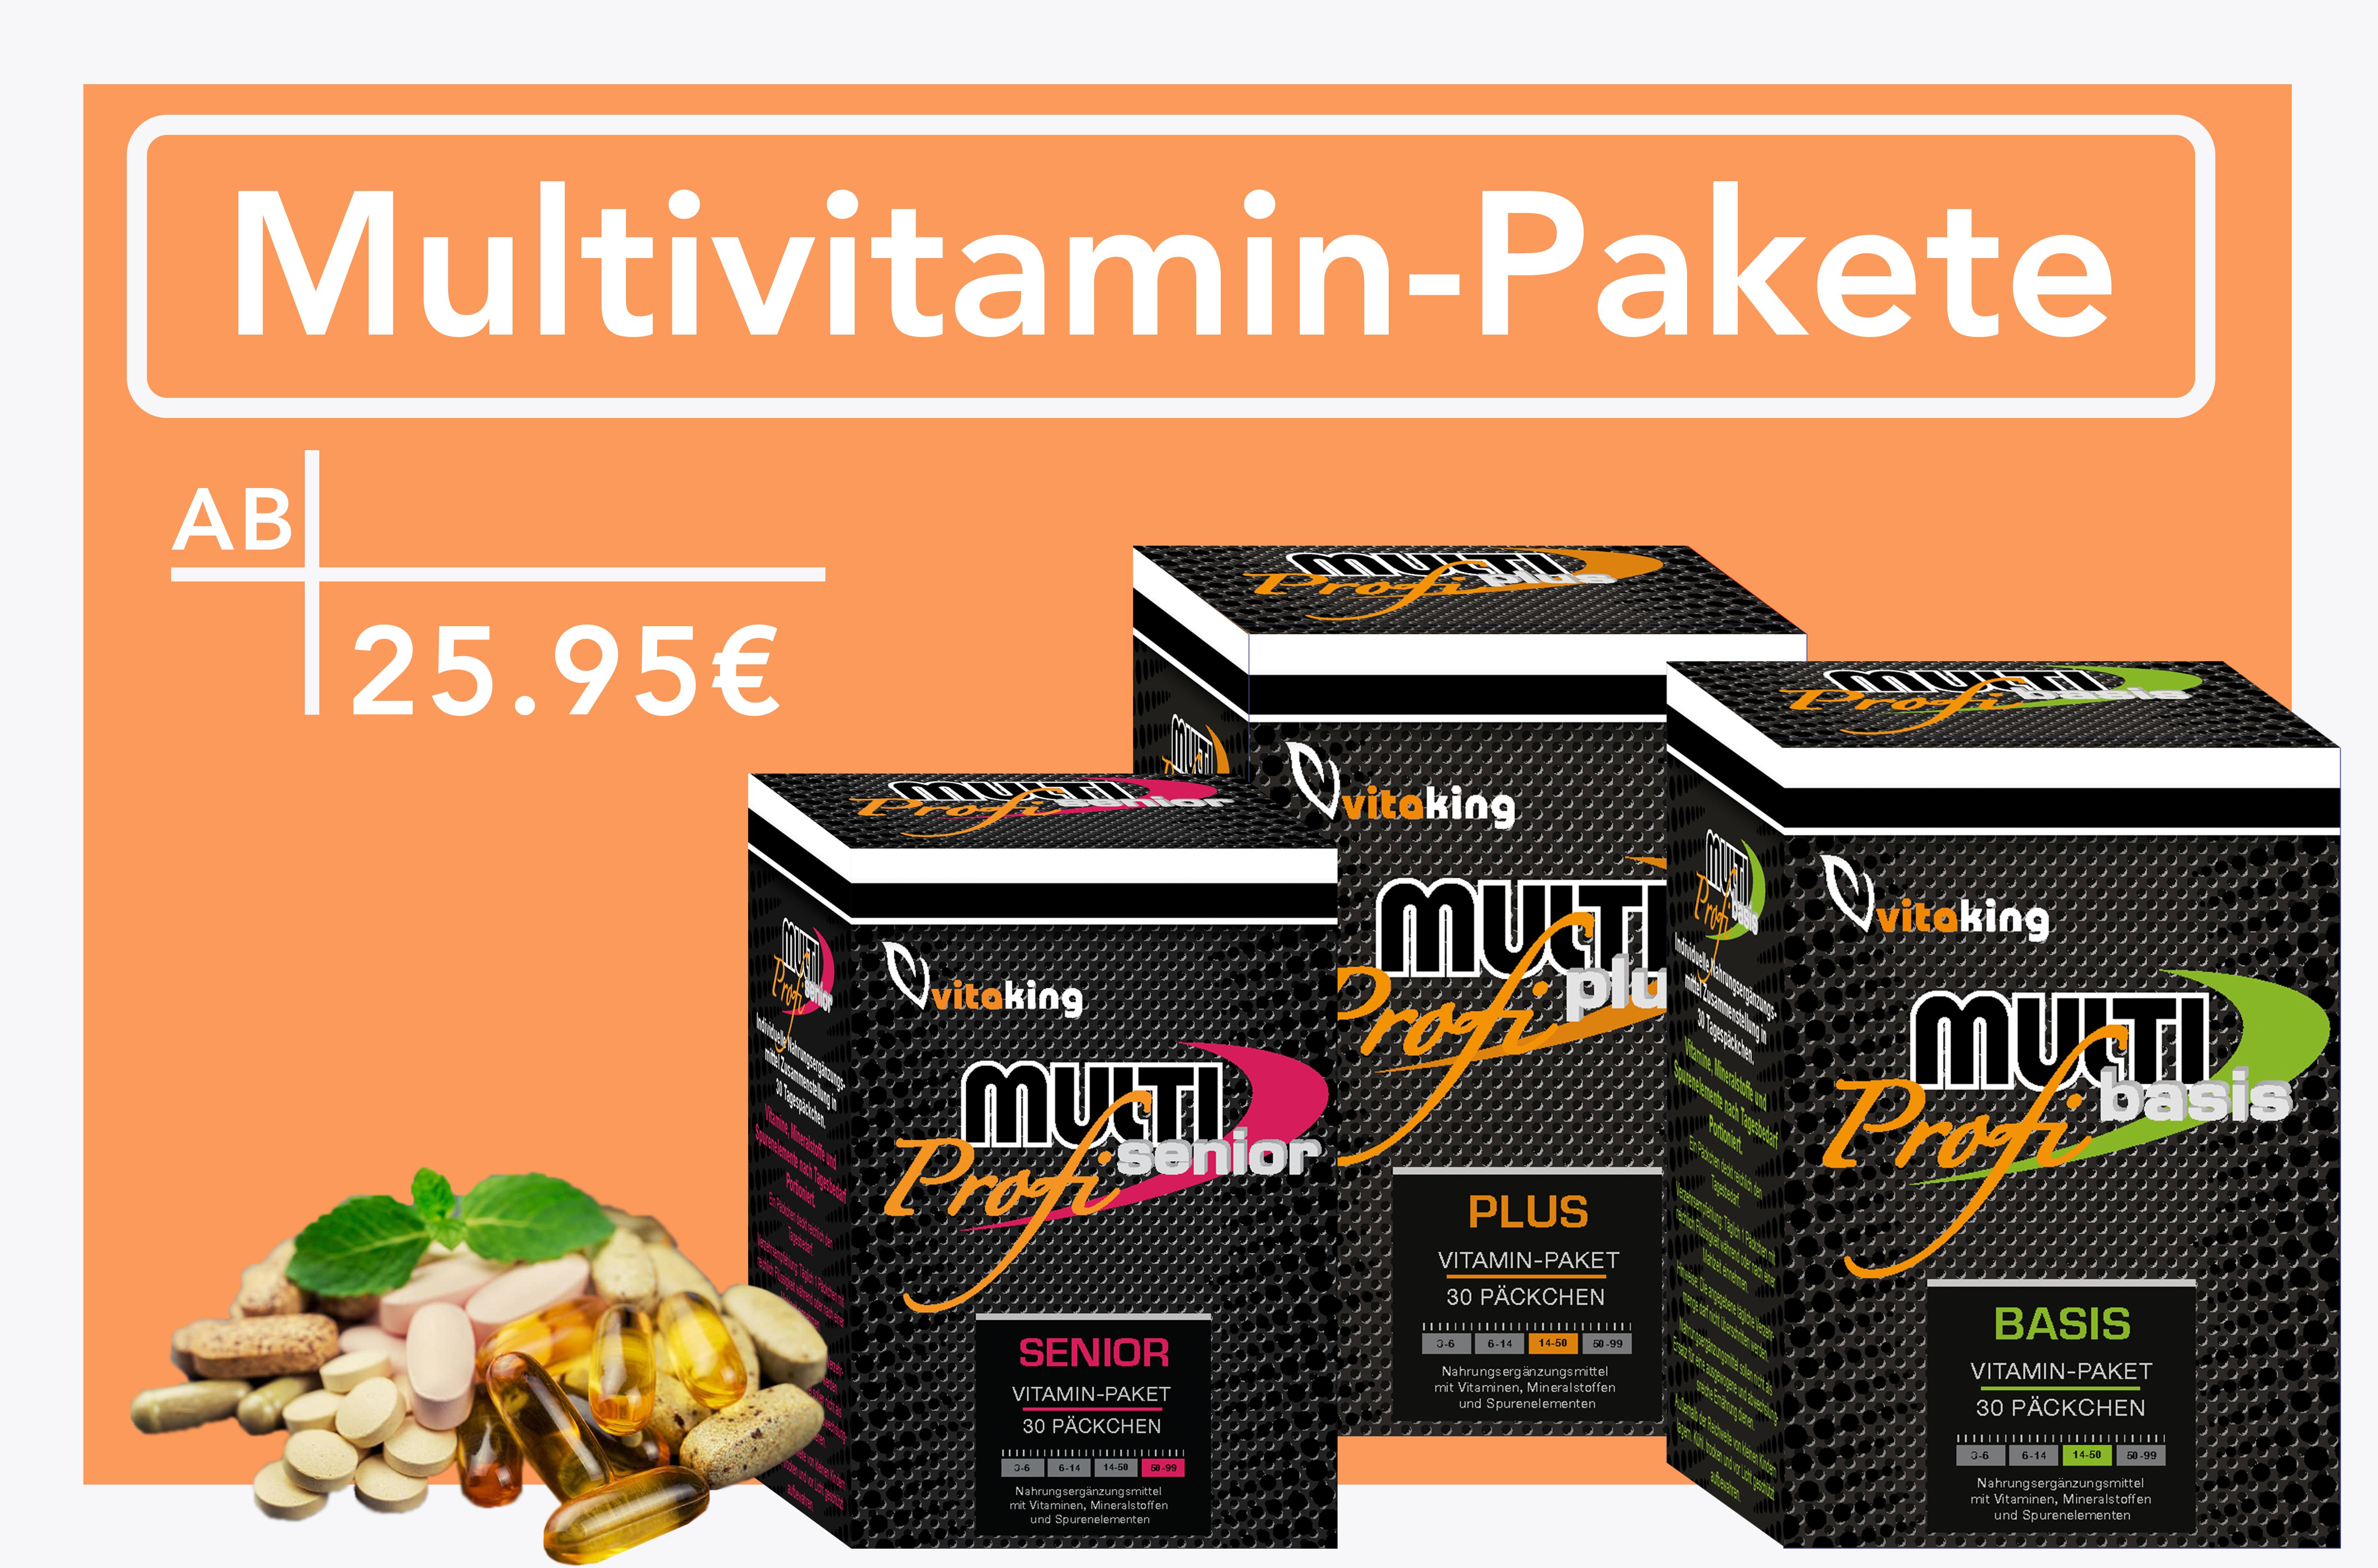 Multivitamin-Pakete